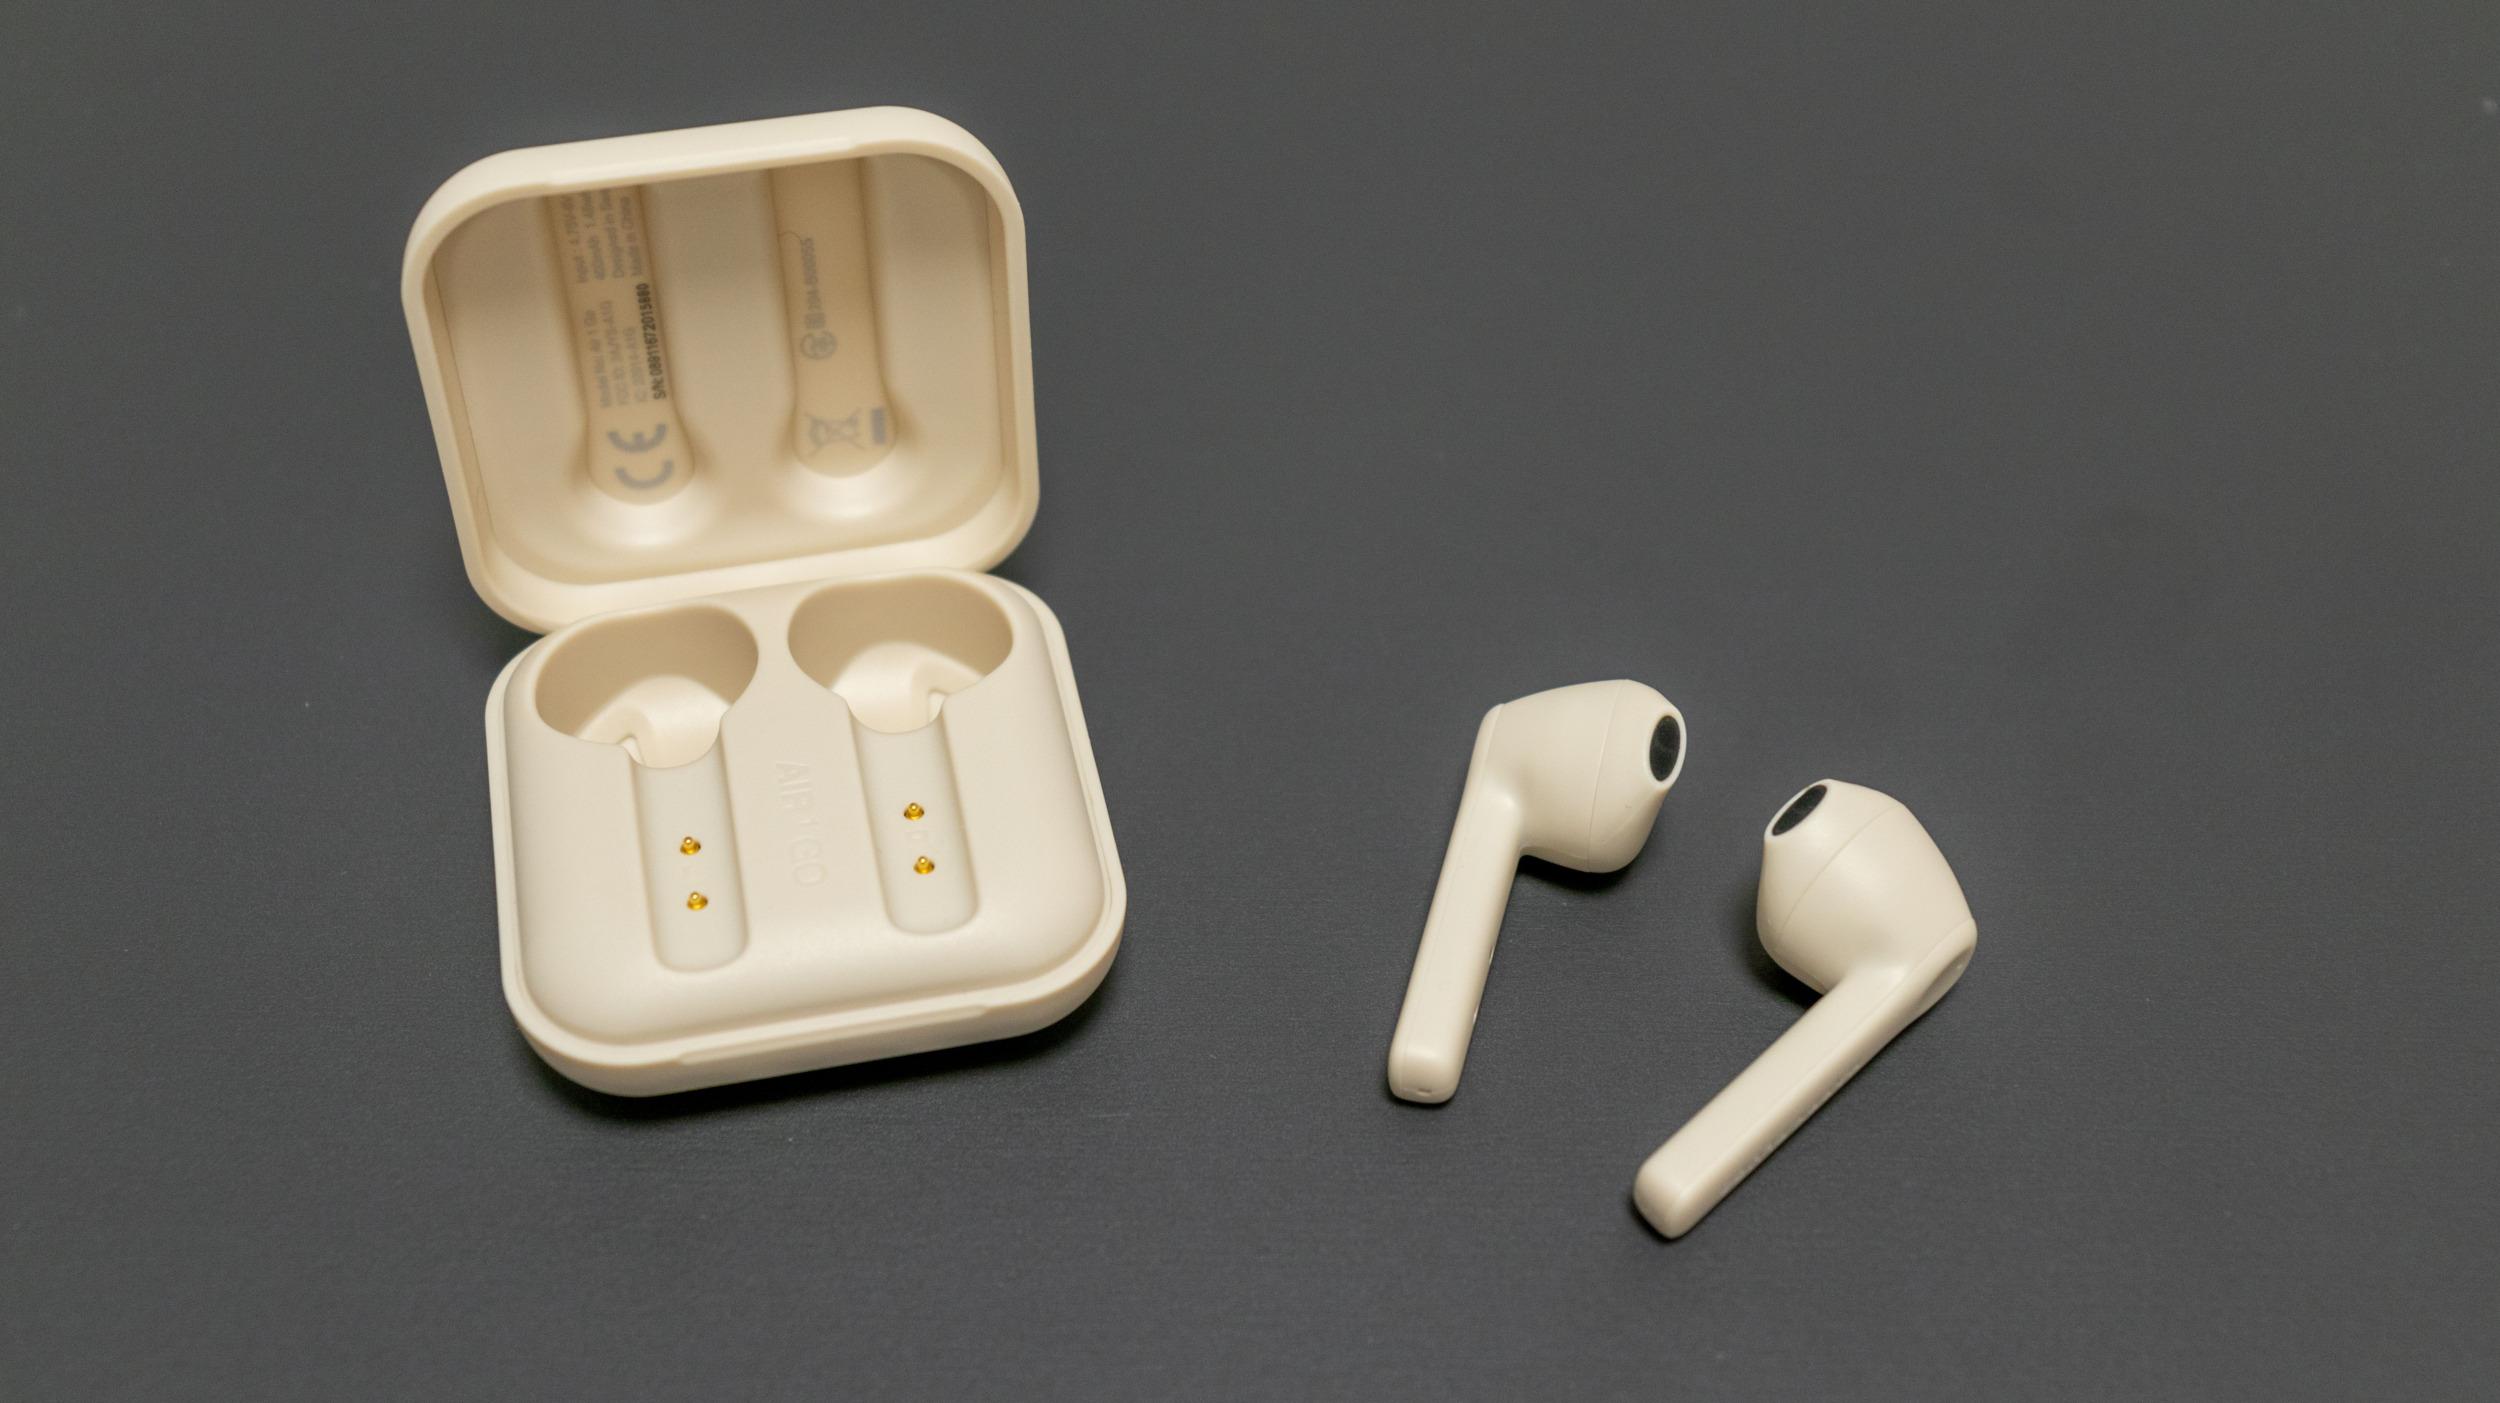 Happy Plugs Air 1 Go – dostupná bezdrátová sluchátka [recenze]